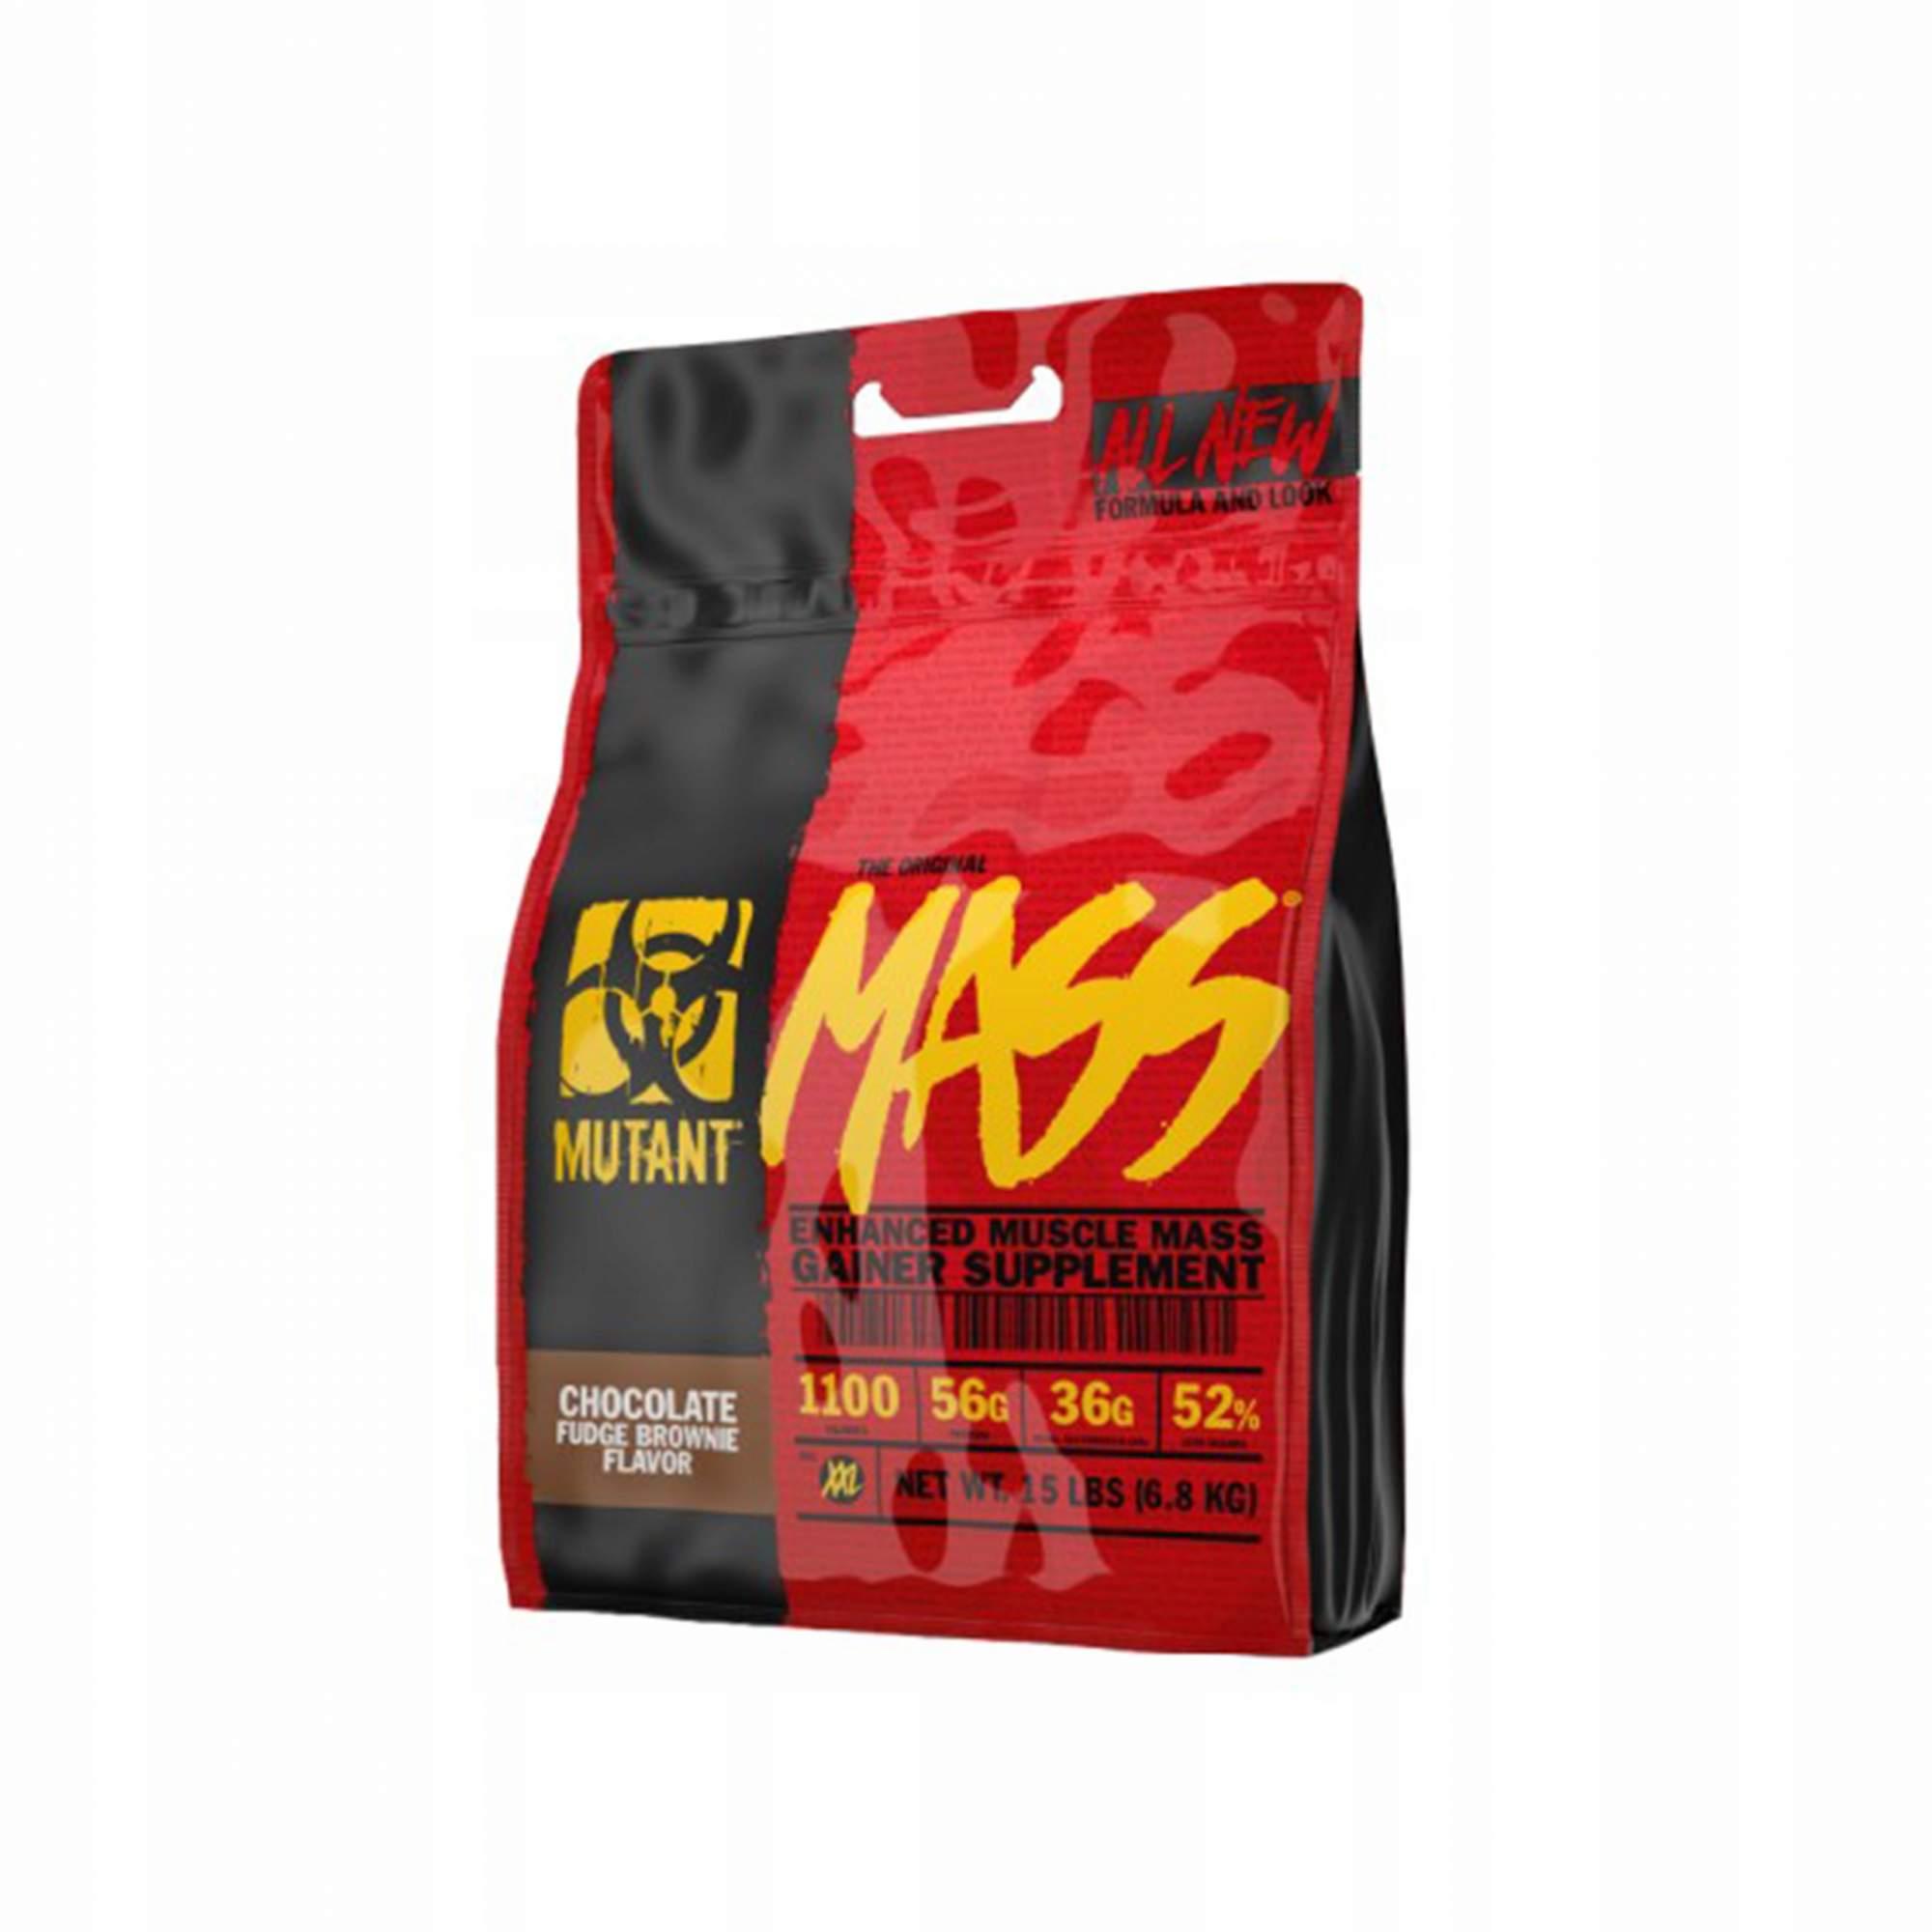 Гейнер Mutant Mass 6800 г Chocolate Fudge Brownie